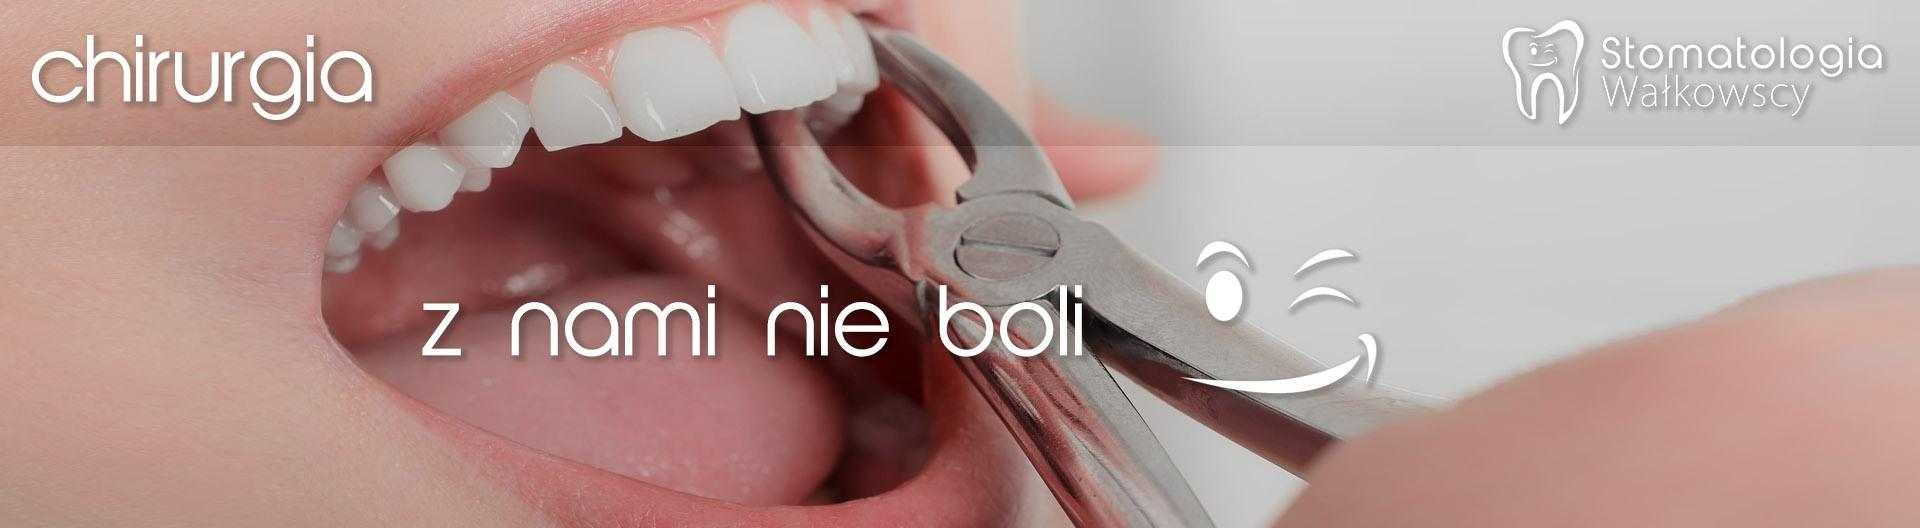 Chirurgia stomatologiczna Piła